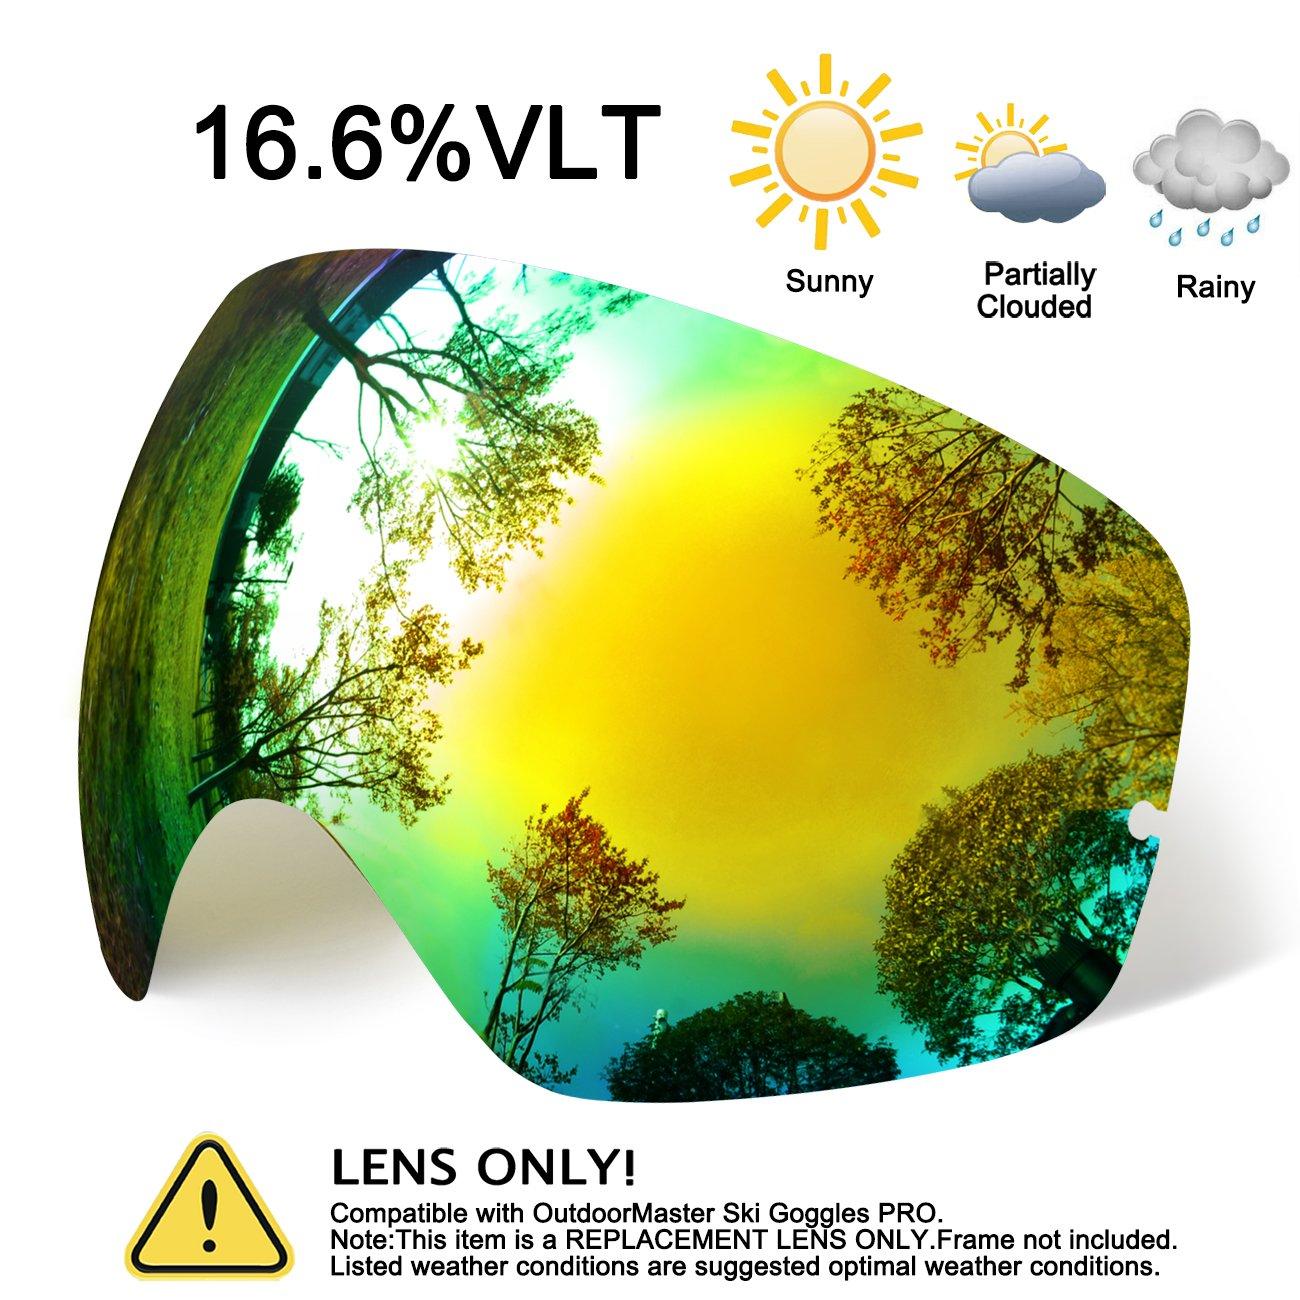 hongdak Ski Goggles Lens, Snowboard Goggles UV Protection, Snow Goggles Helmet Compatible men women boys girls kids, Anti fog OTG Gold Lens